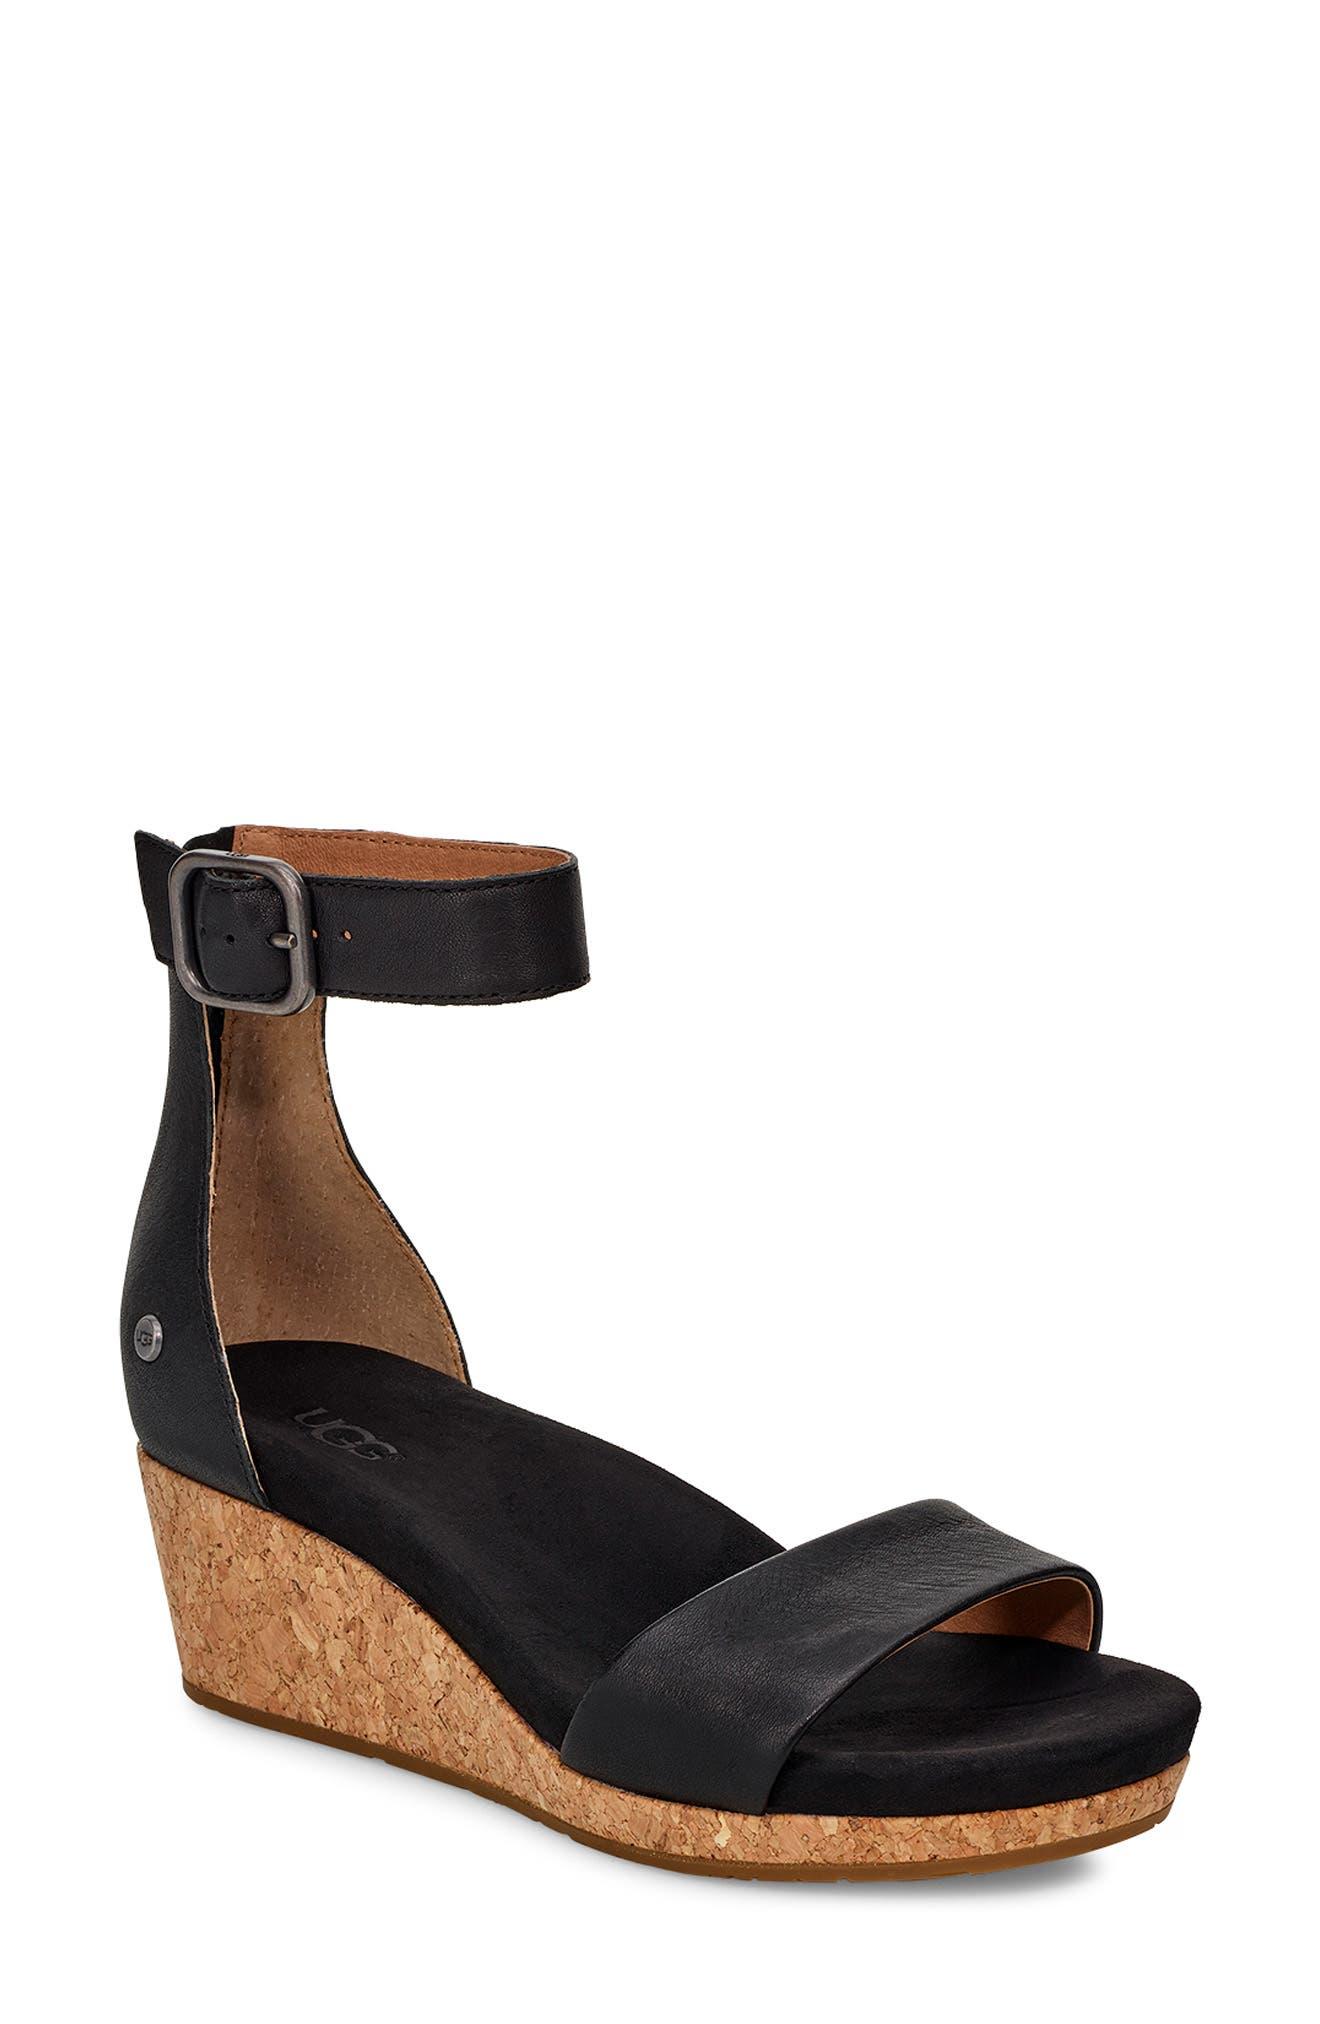 Zoe II Wedge Sandal, Main, color, BLACK LEATHER